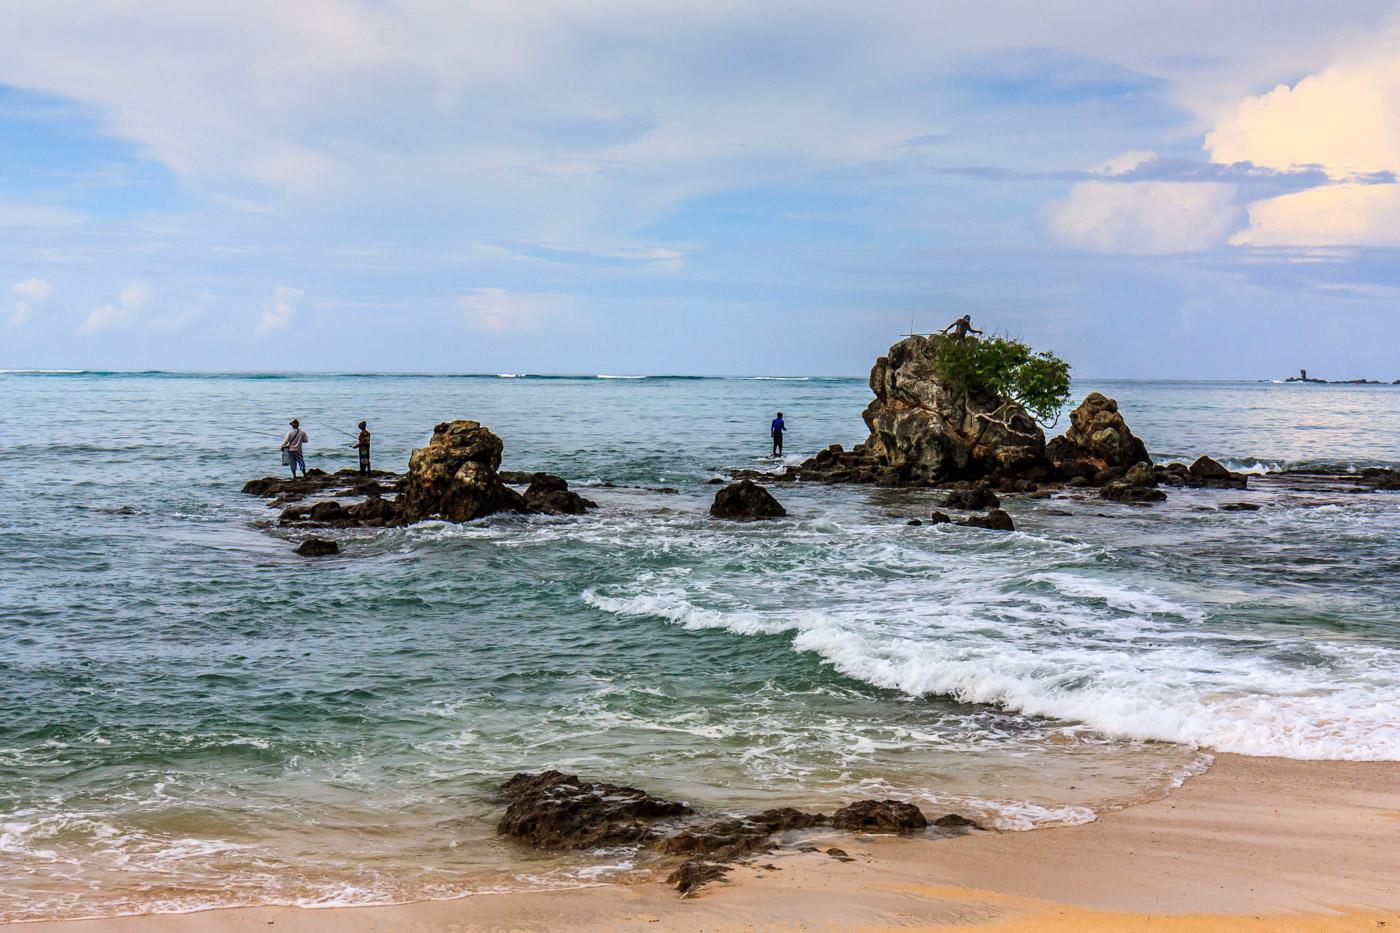 Fishing on the rocks.